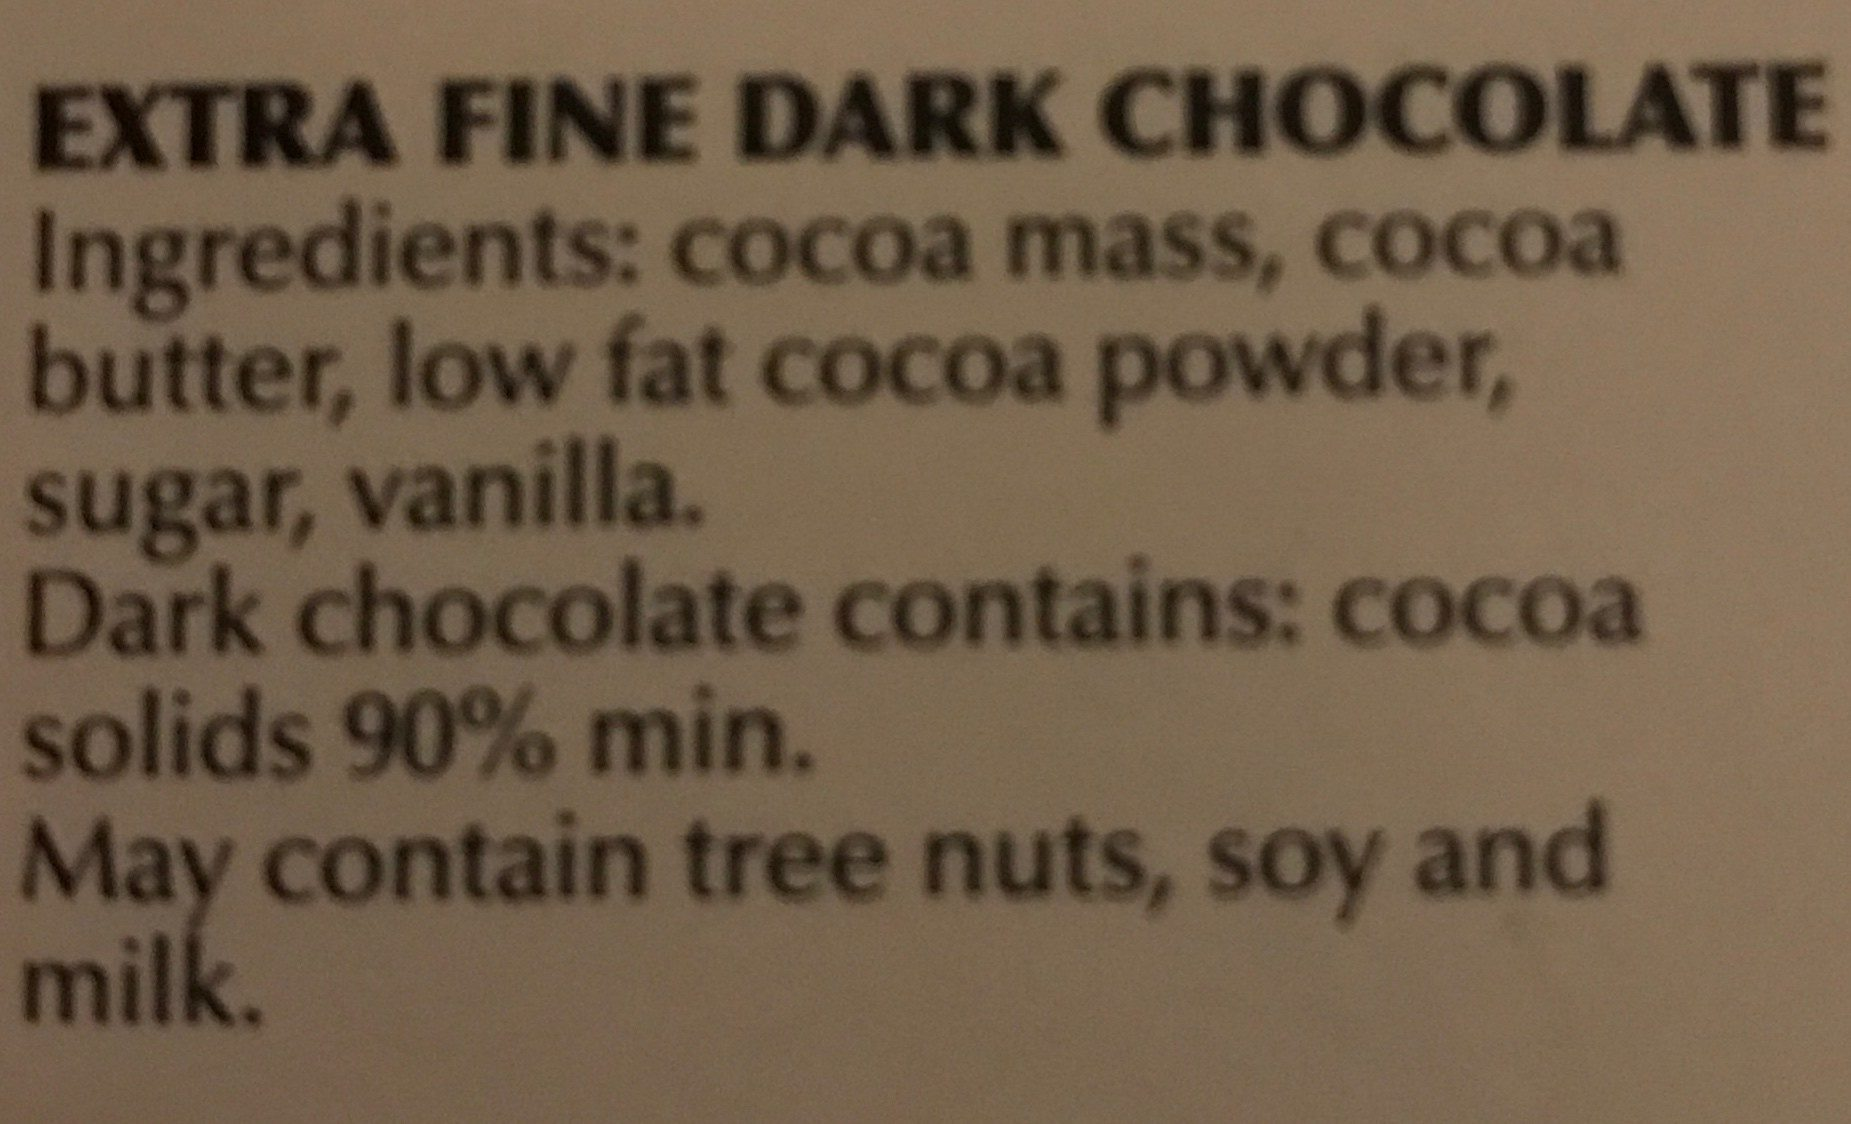 Supreme dark 90% cocoa - Ingredients - en